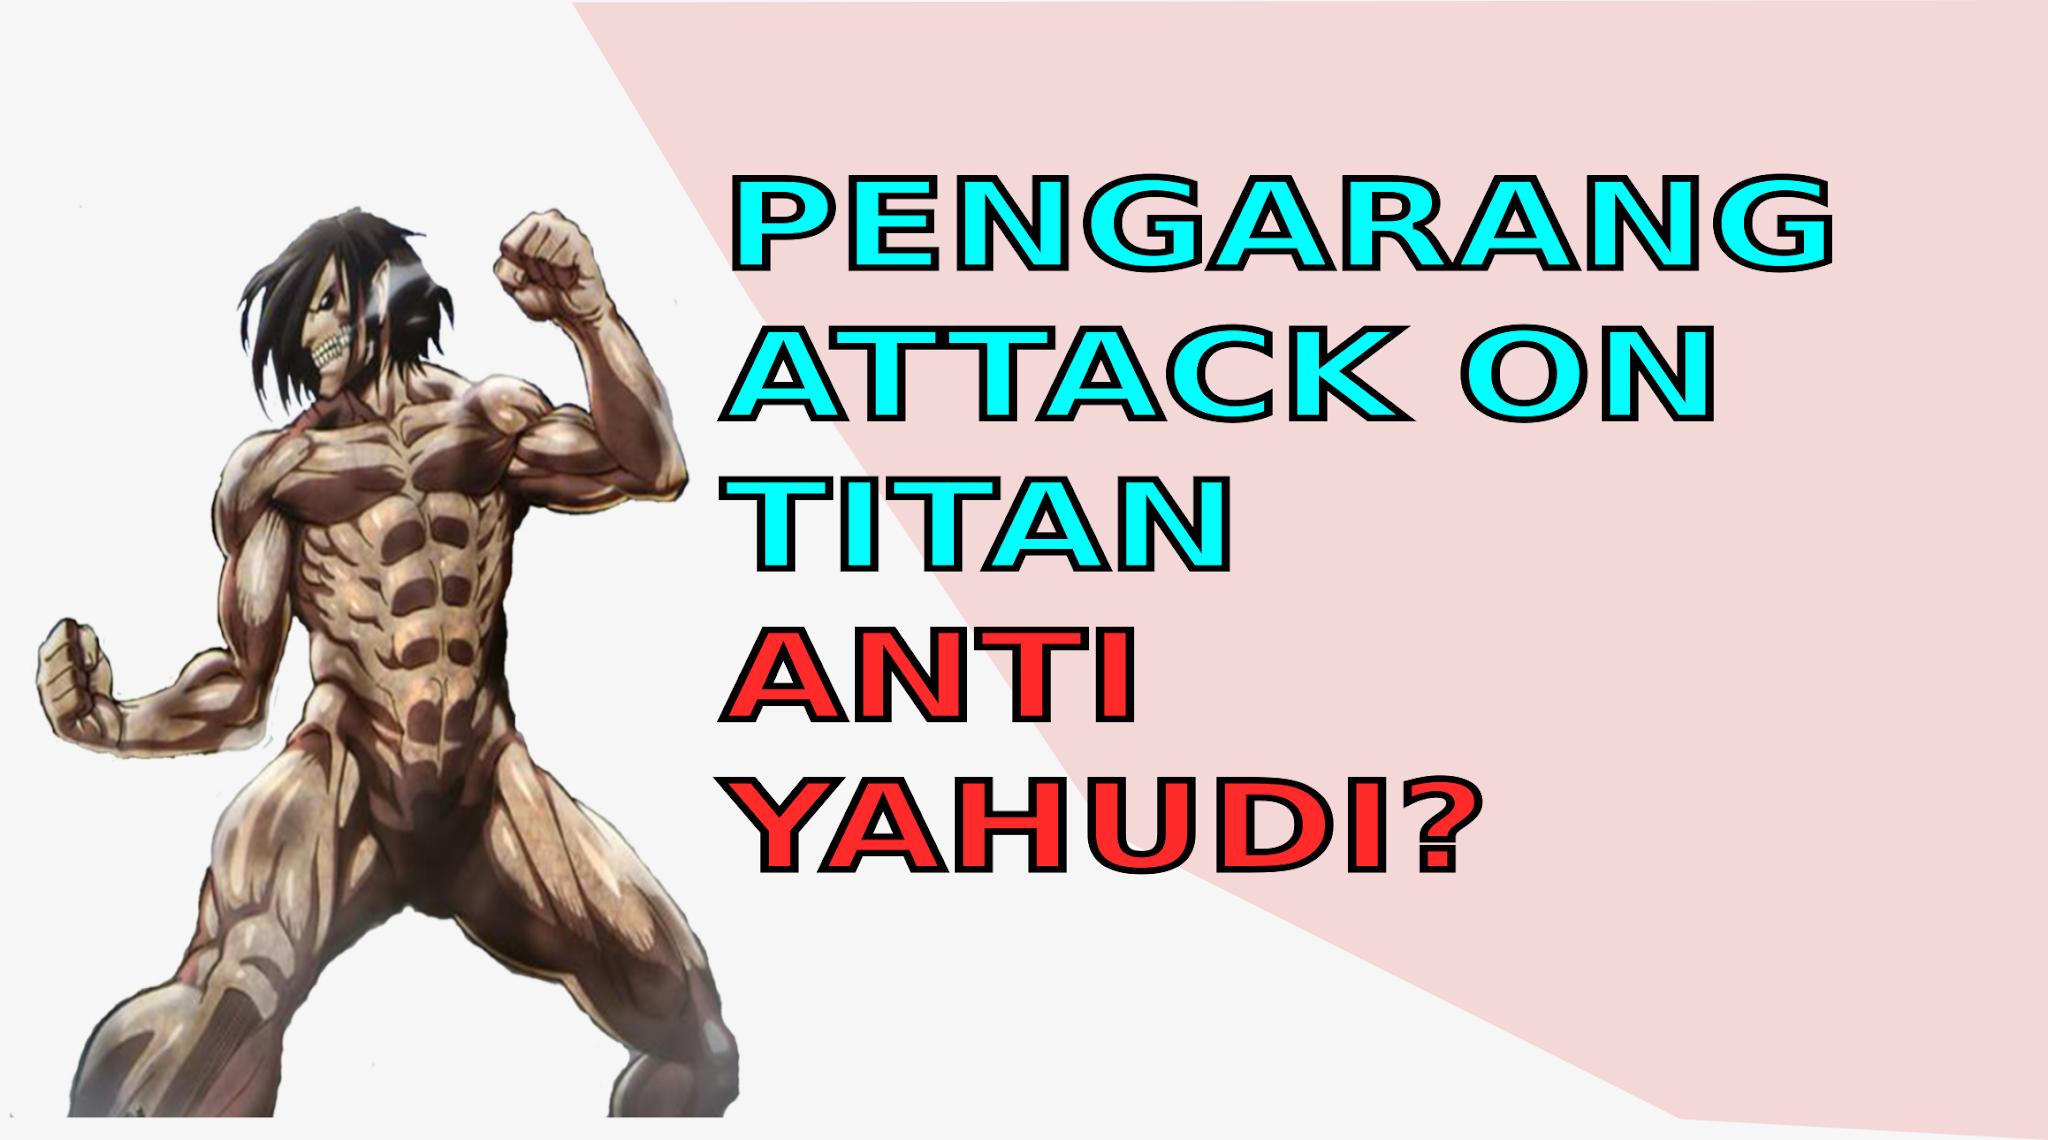 Pengarang Attack on Titan shingeki no kyojin Final Season 4 Hajime Ishayama Anti Semit Yahudi dan Fasis